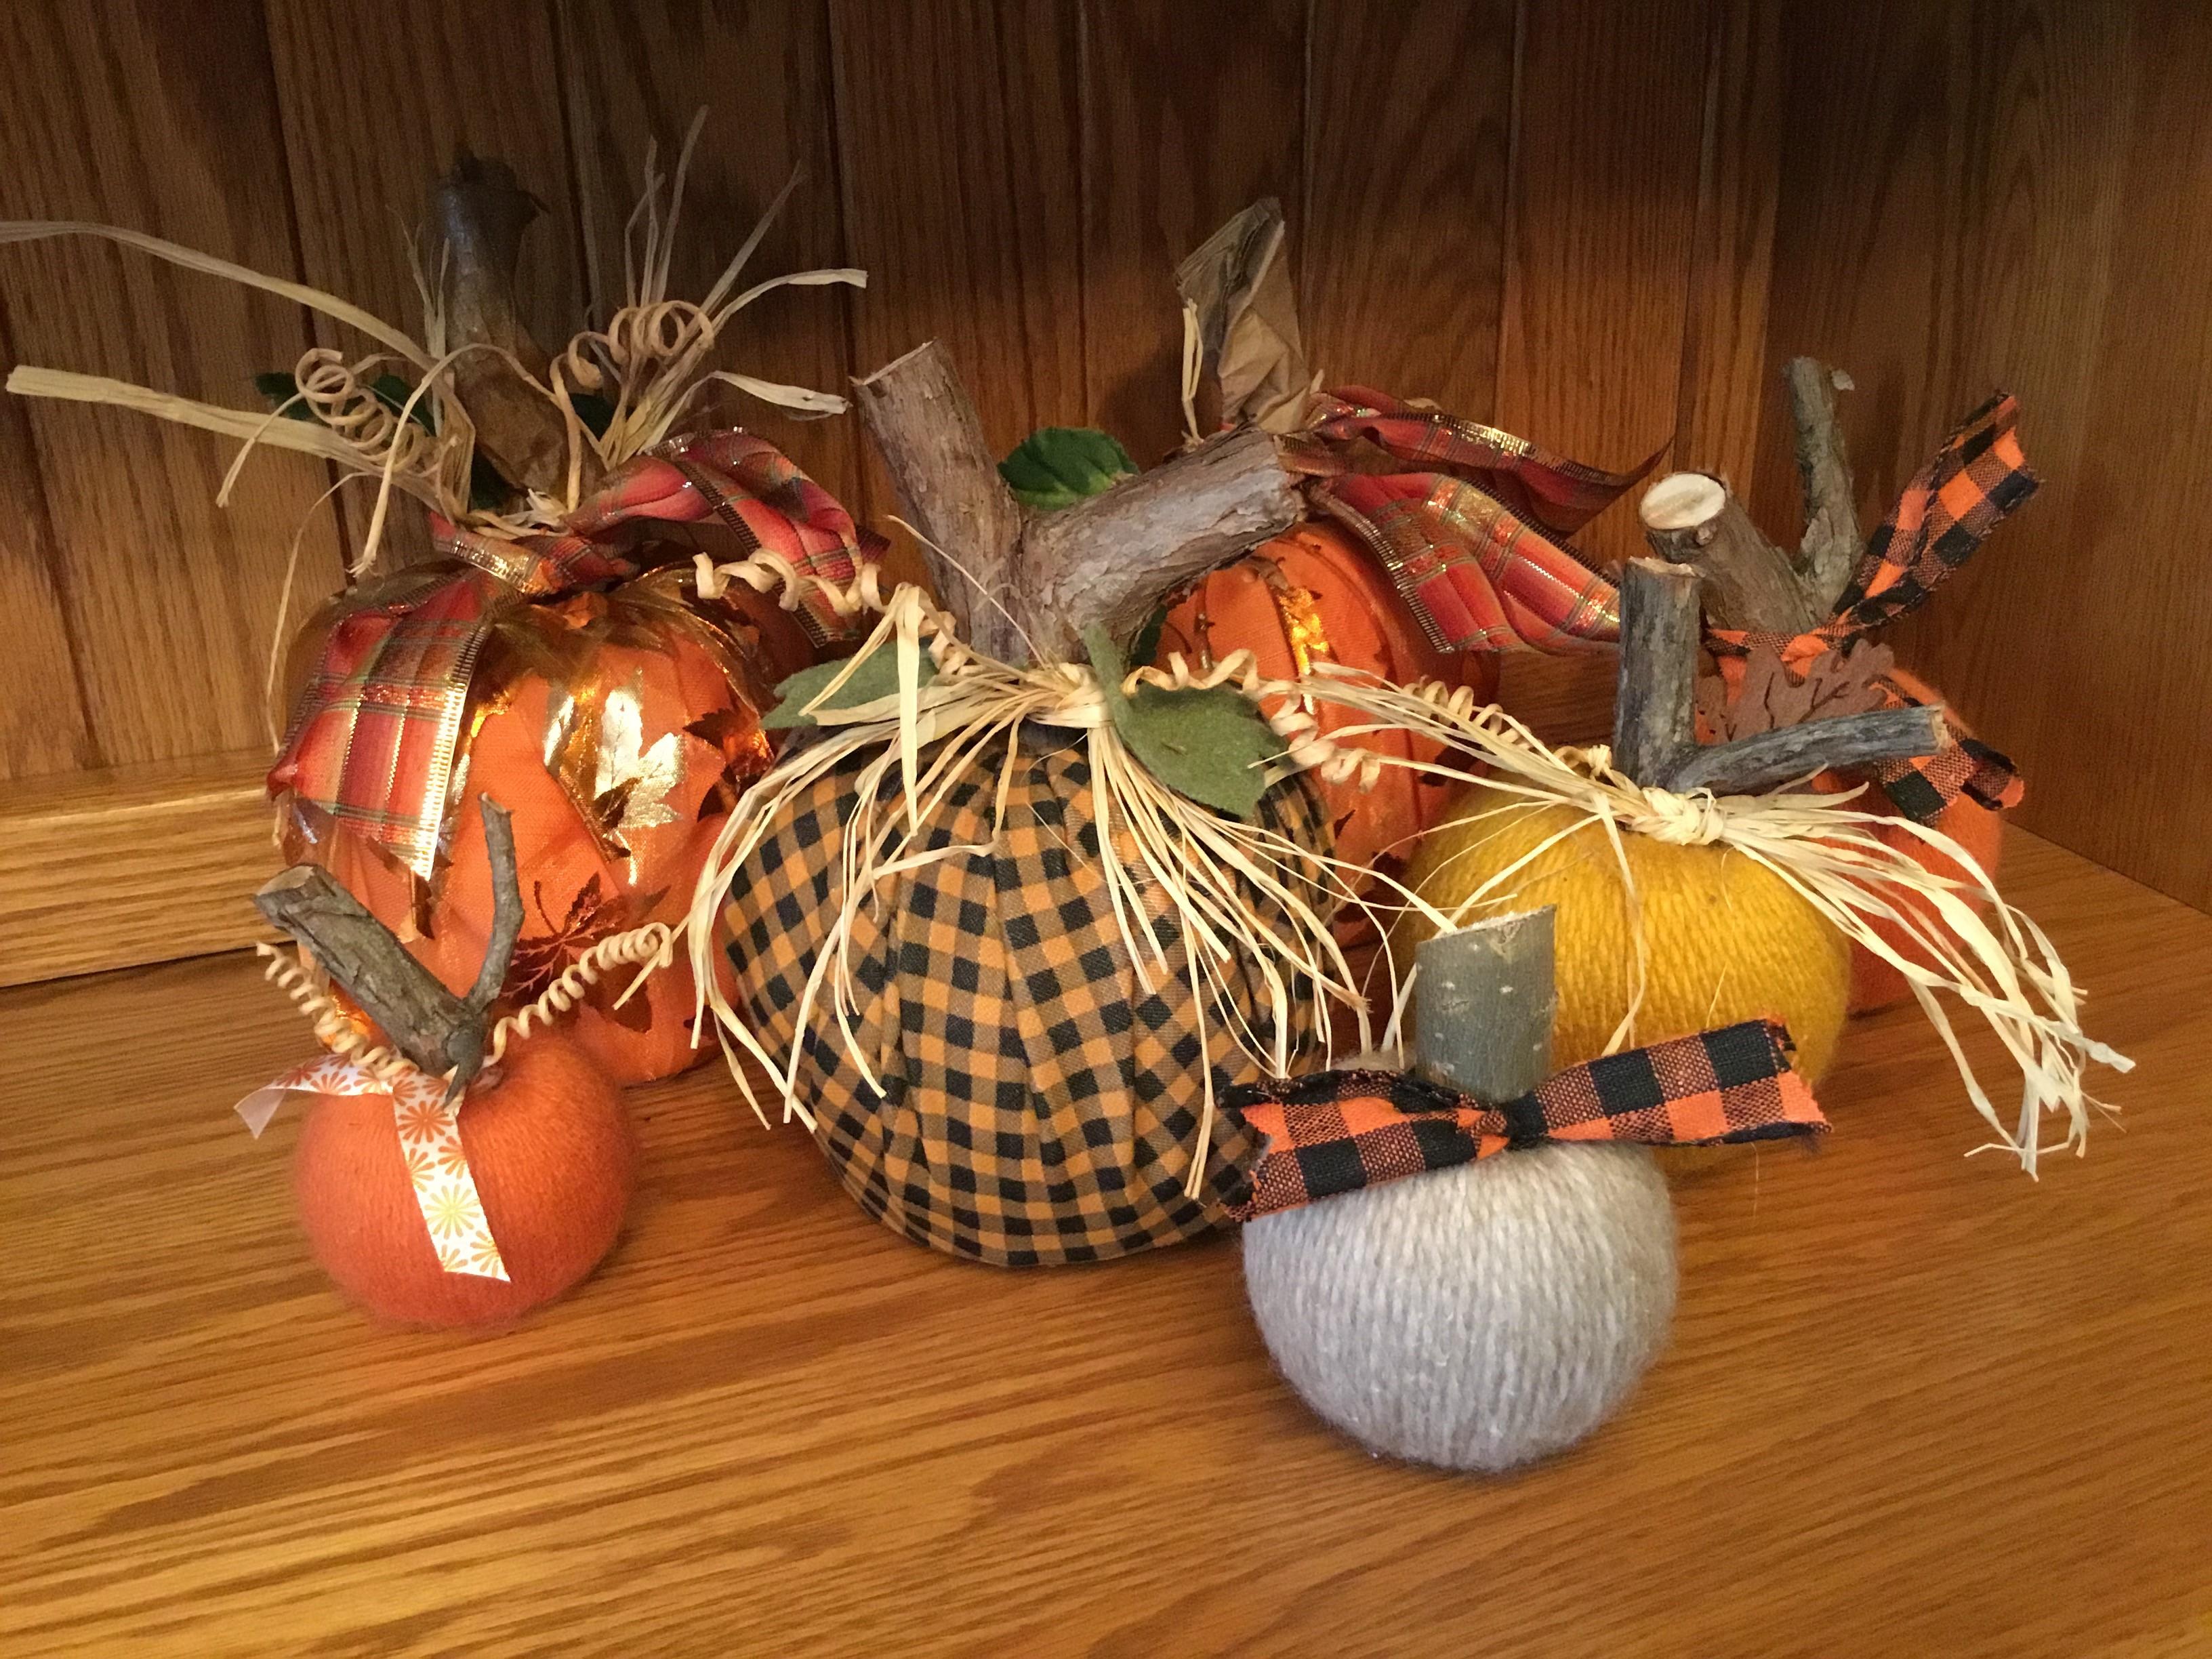 TP and yarn pumpkins